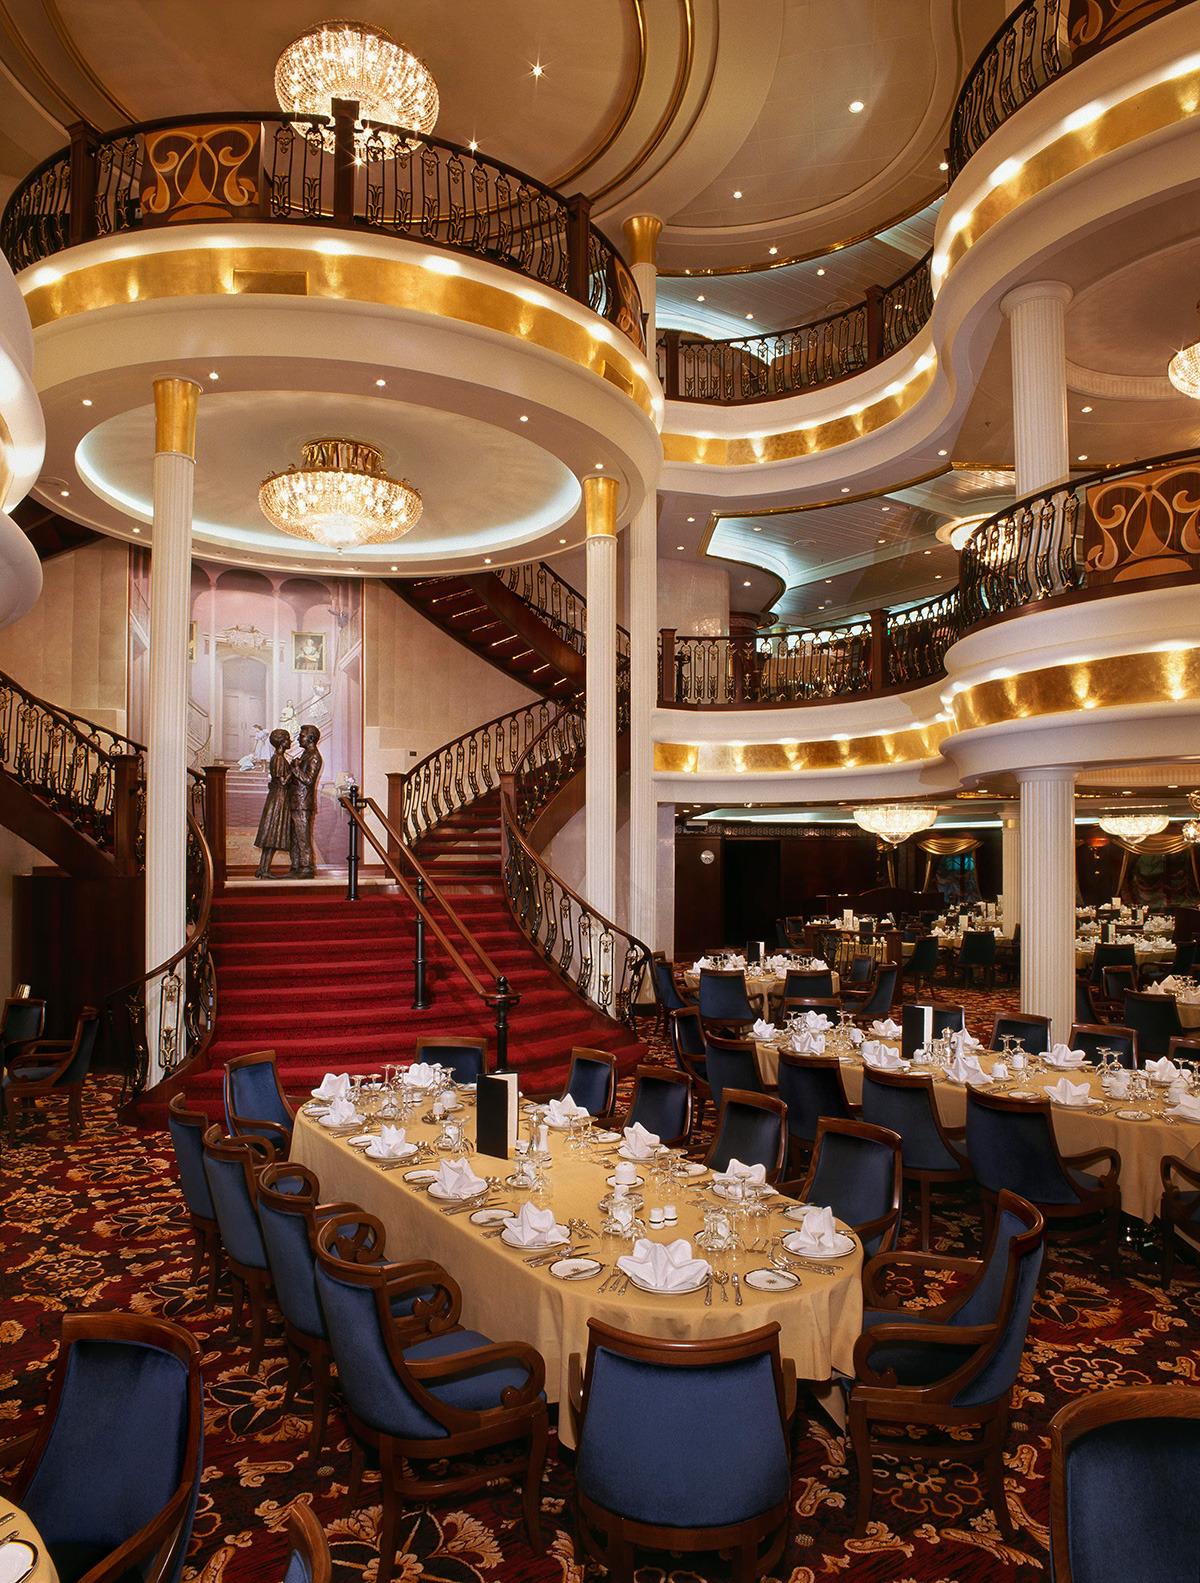 Круизный лайнер Mariner of the Seas - Главная столовая (Dining room)